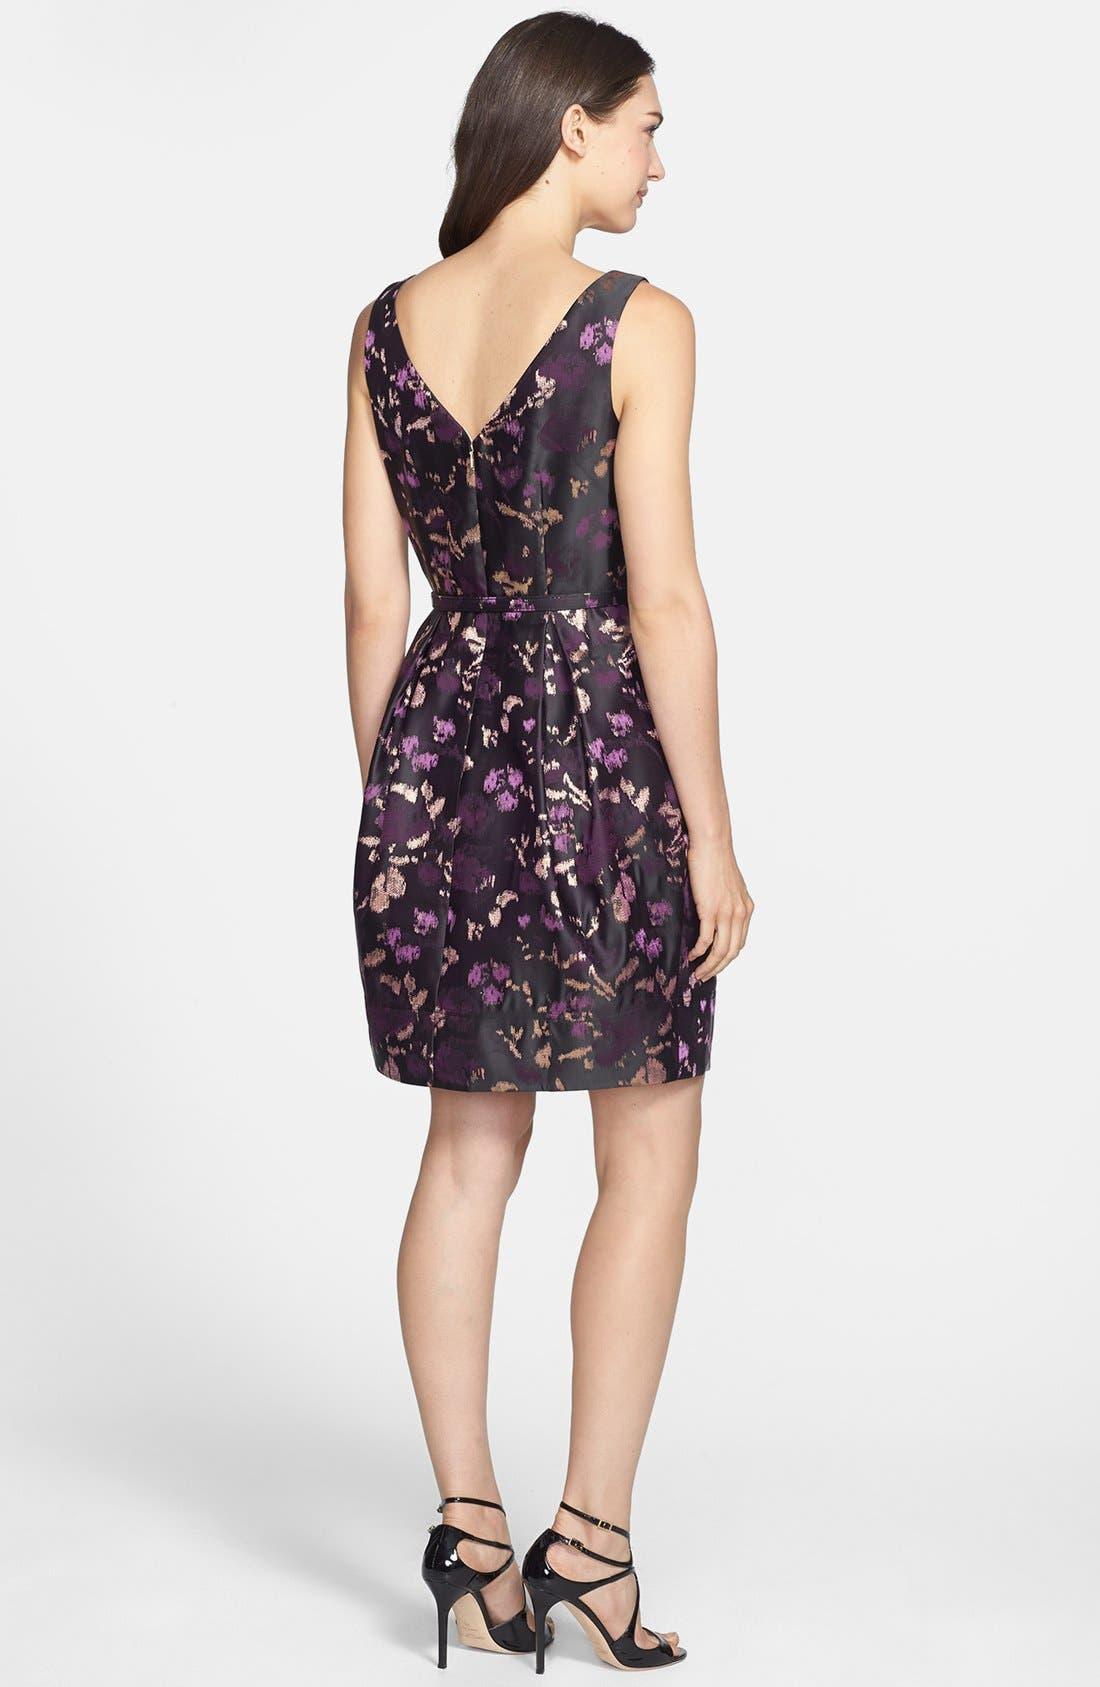 ELIZA J, Brocade Fit & Flare Dress, Alternate thumbnail 3, color, 500